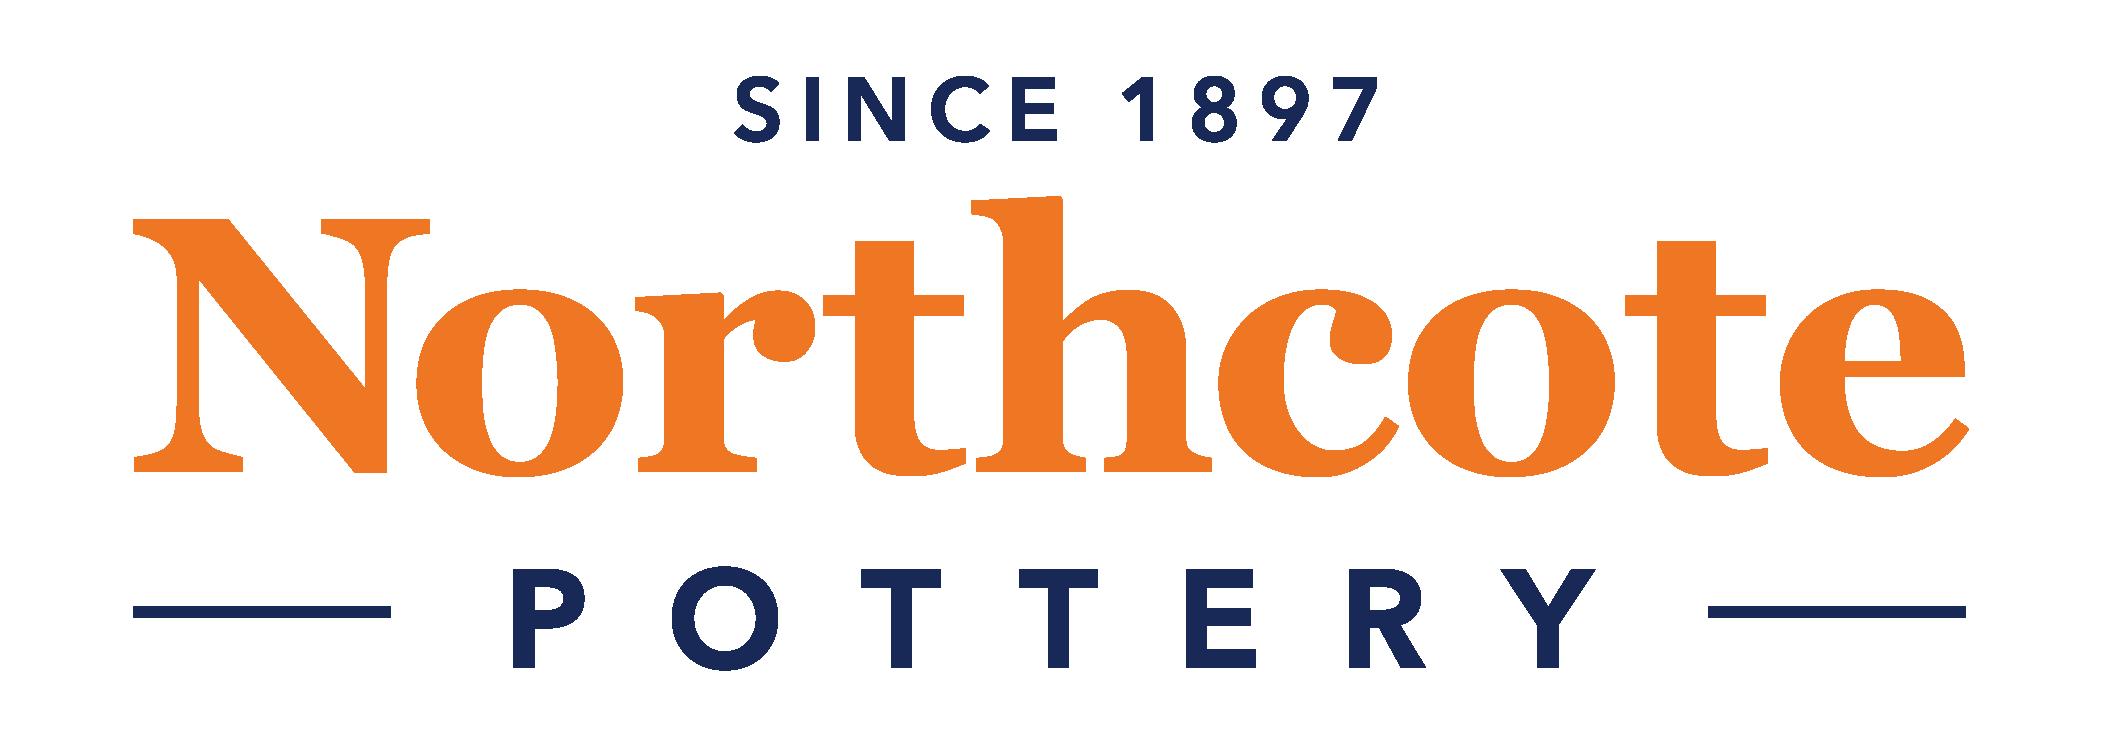 northcote logo